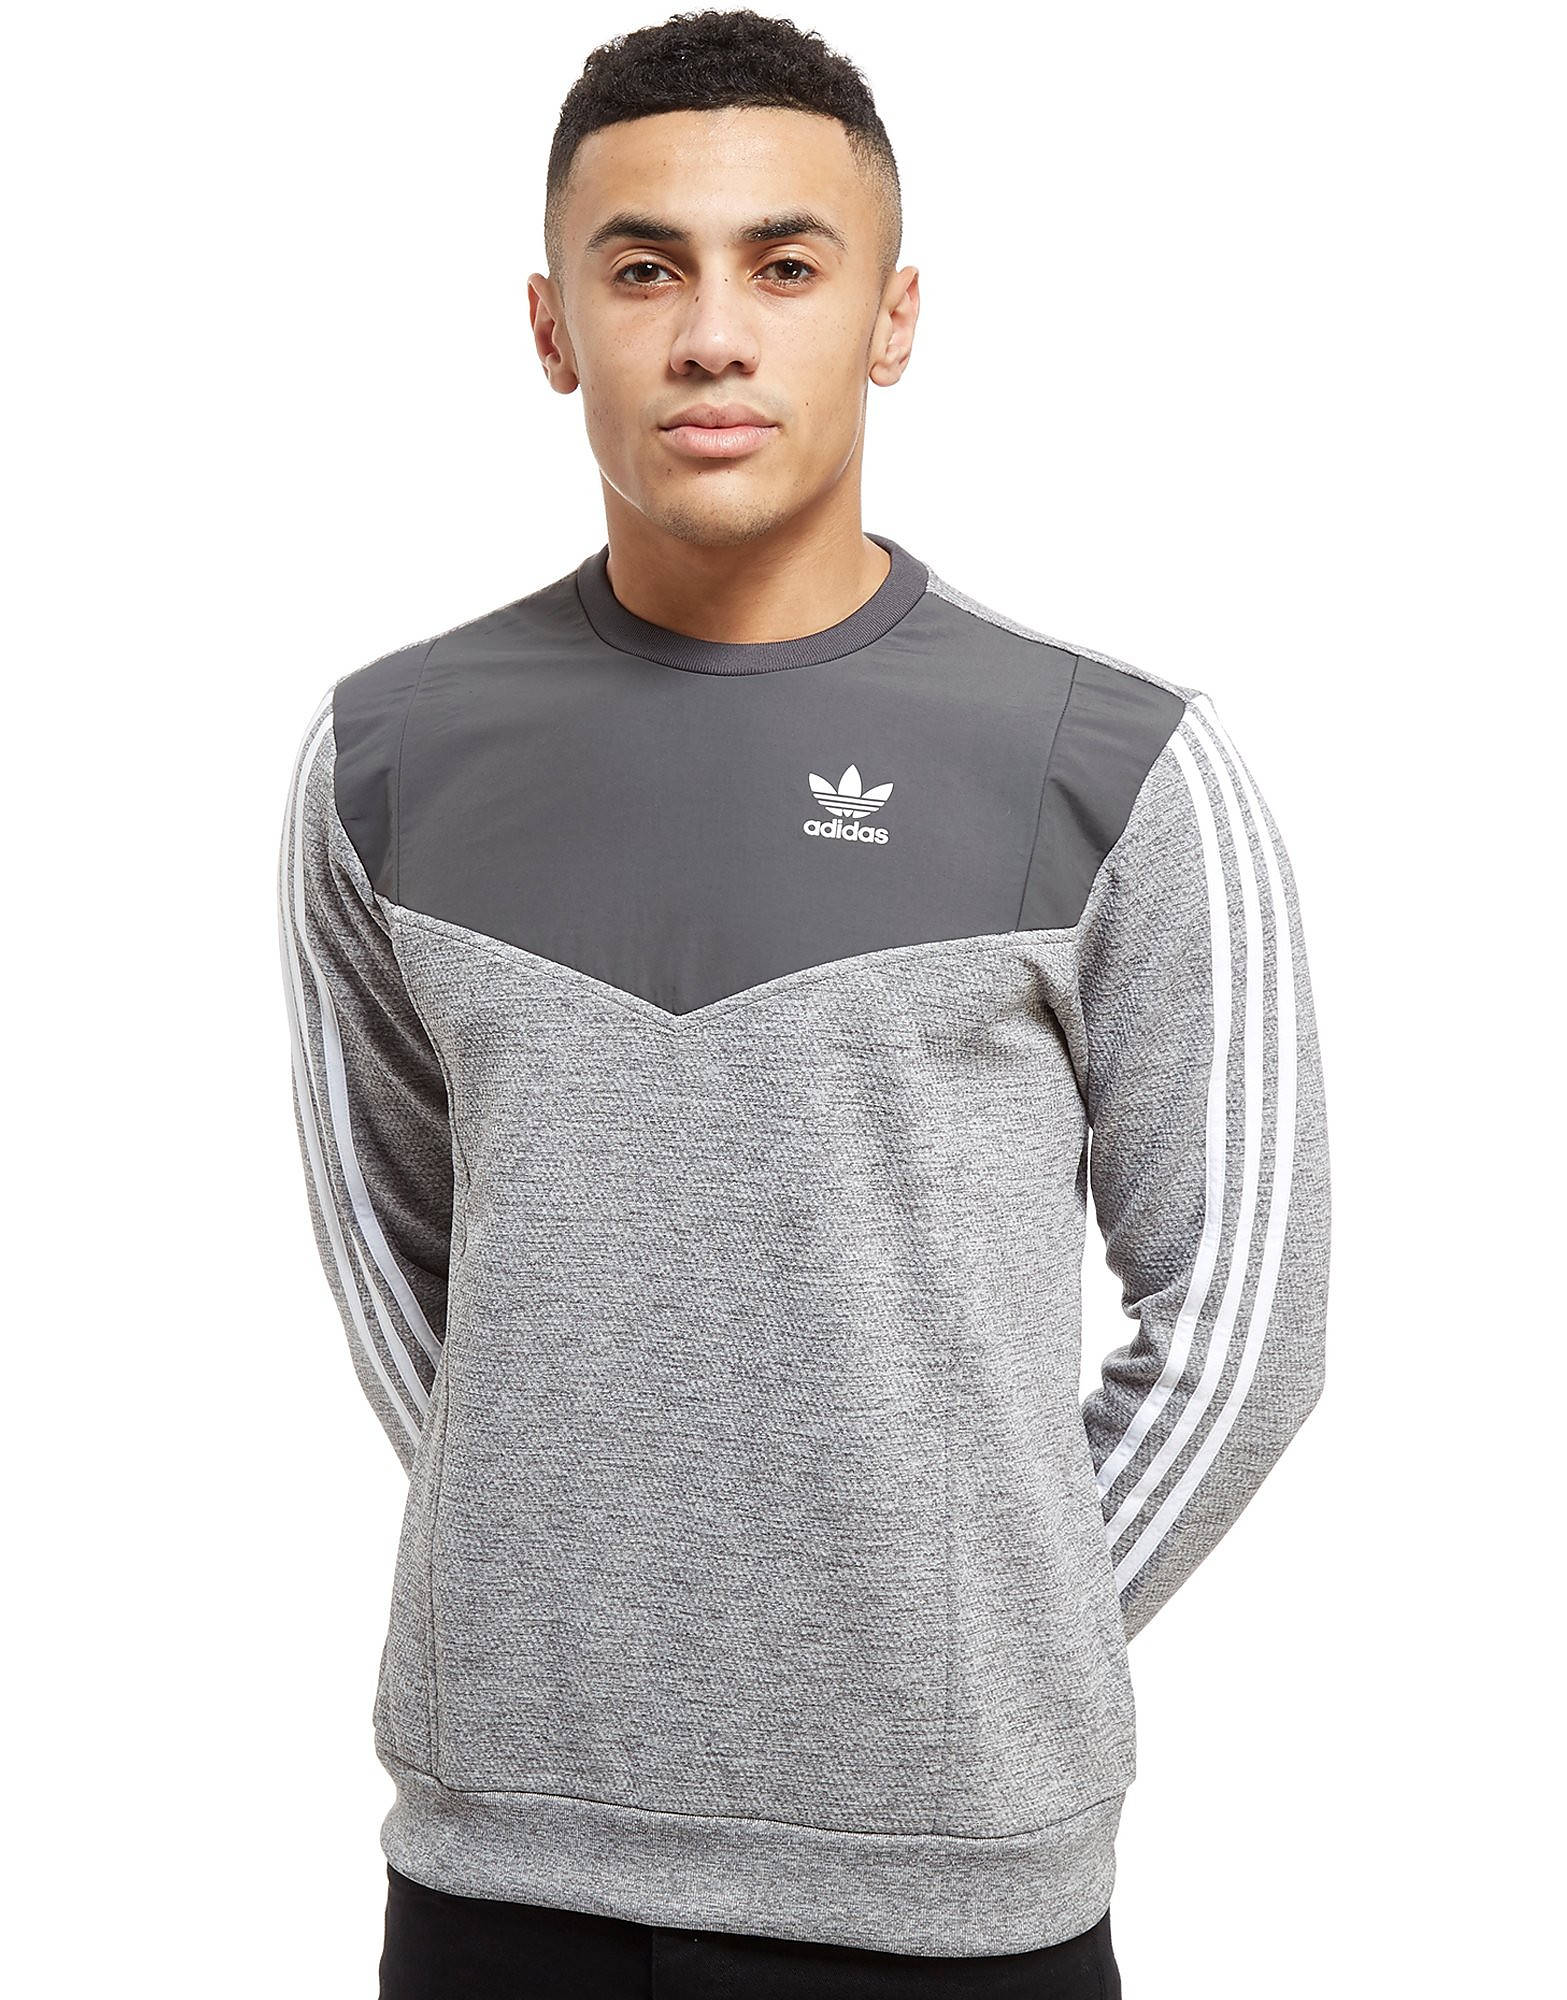 adidas Originals Nova Woven Crew Sweatshirt